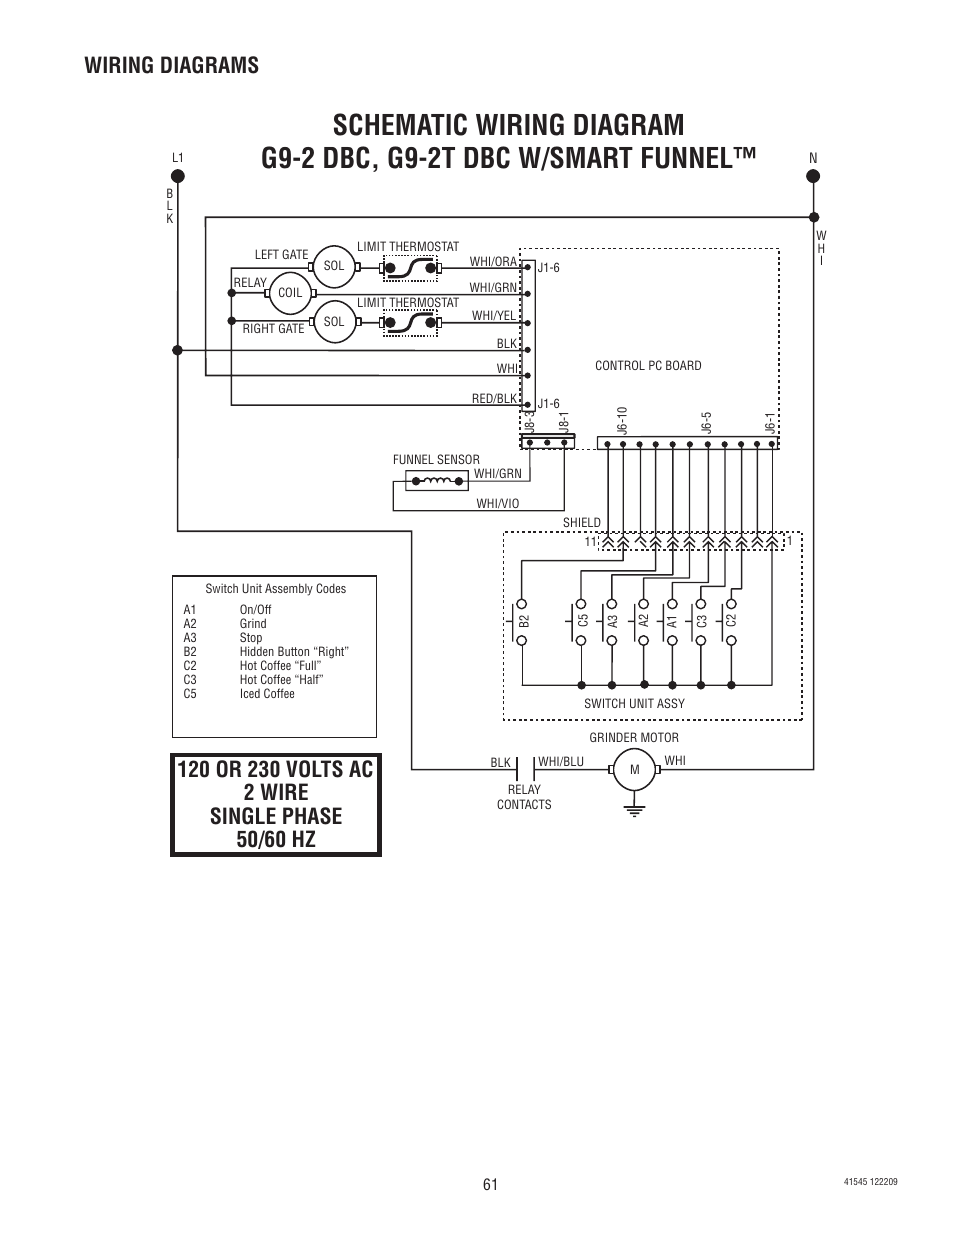 medium resolution of wiring diagrams bunn g9 2t dbc user manual page 61 79 rh manualsdir com bunn coffee